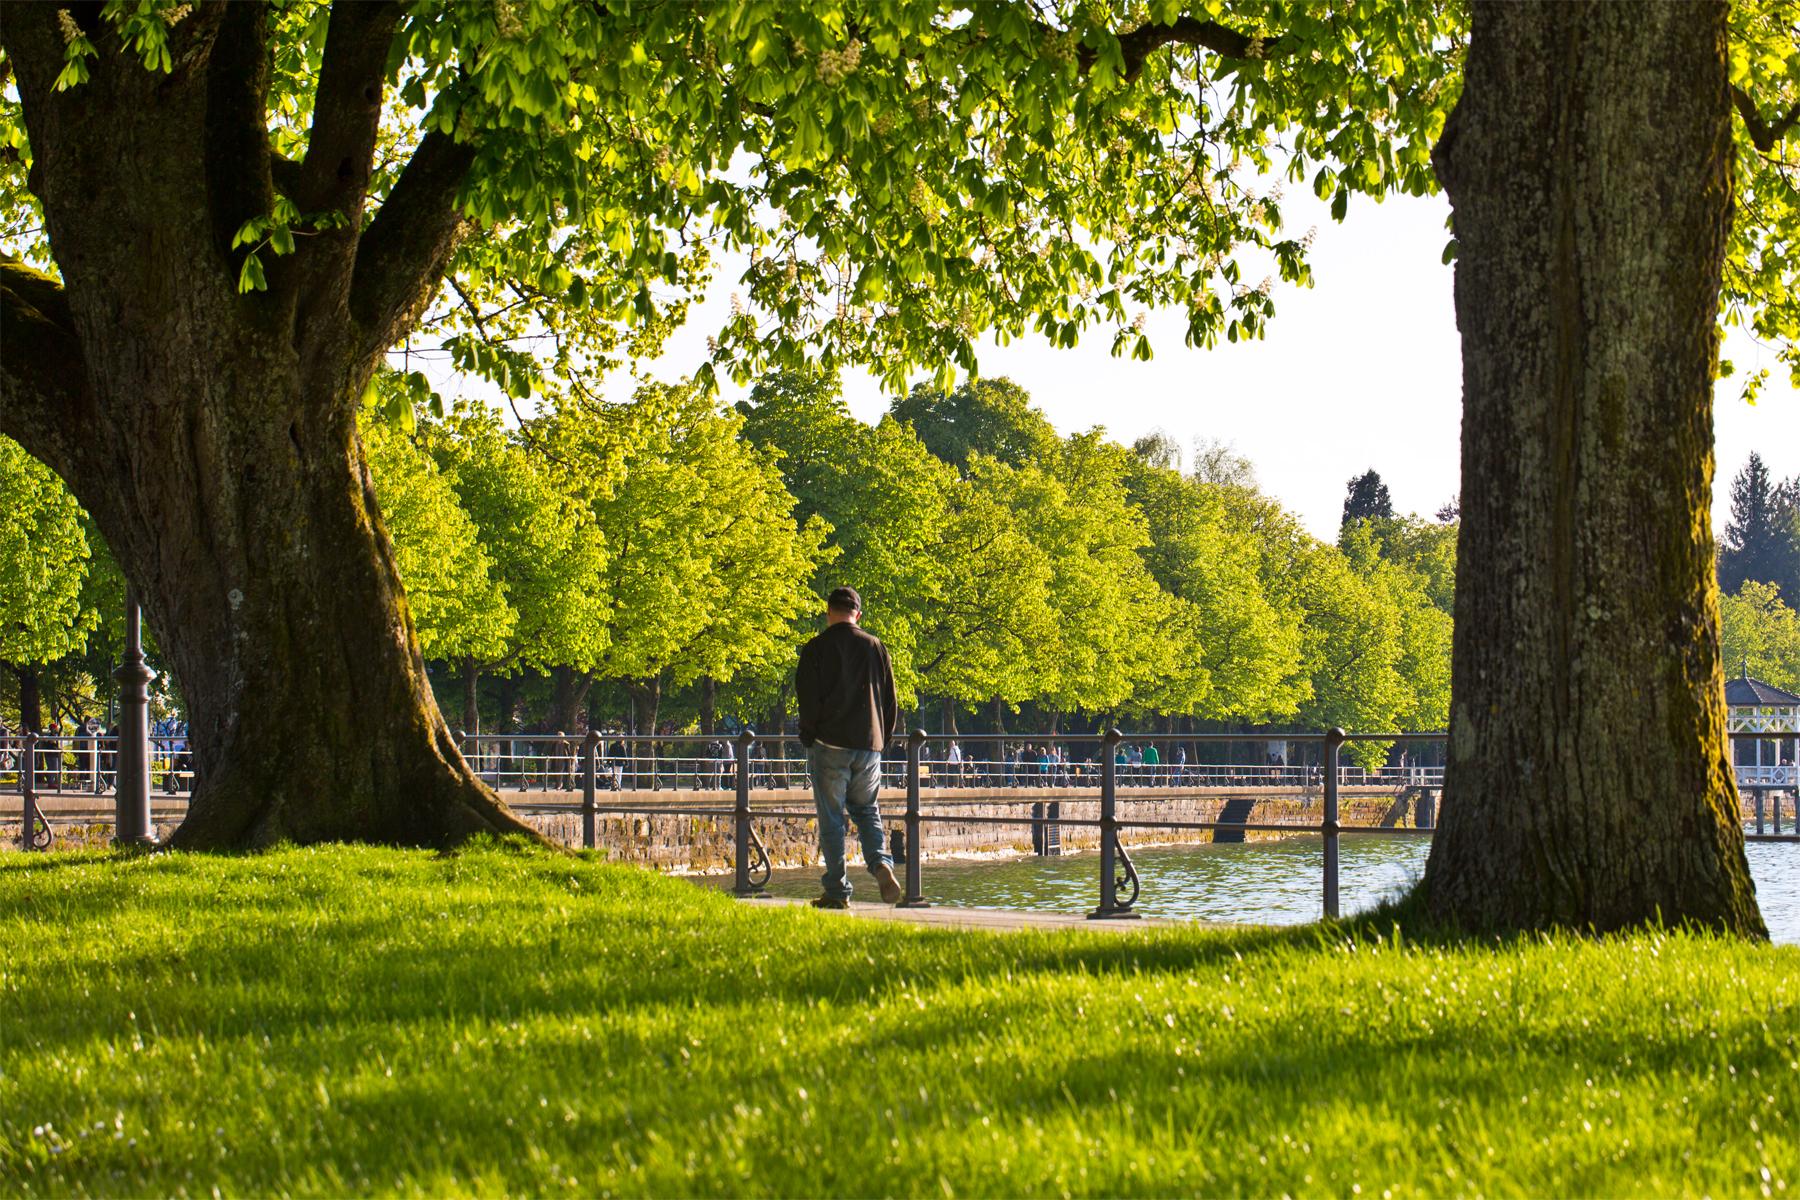 Spaziergänger-Bregenz-Seepromenade-Bodensee-Lake Constance